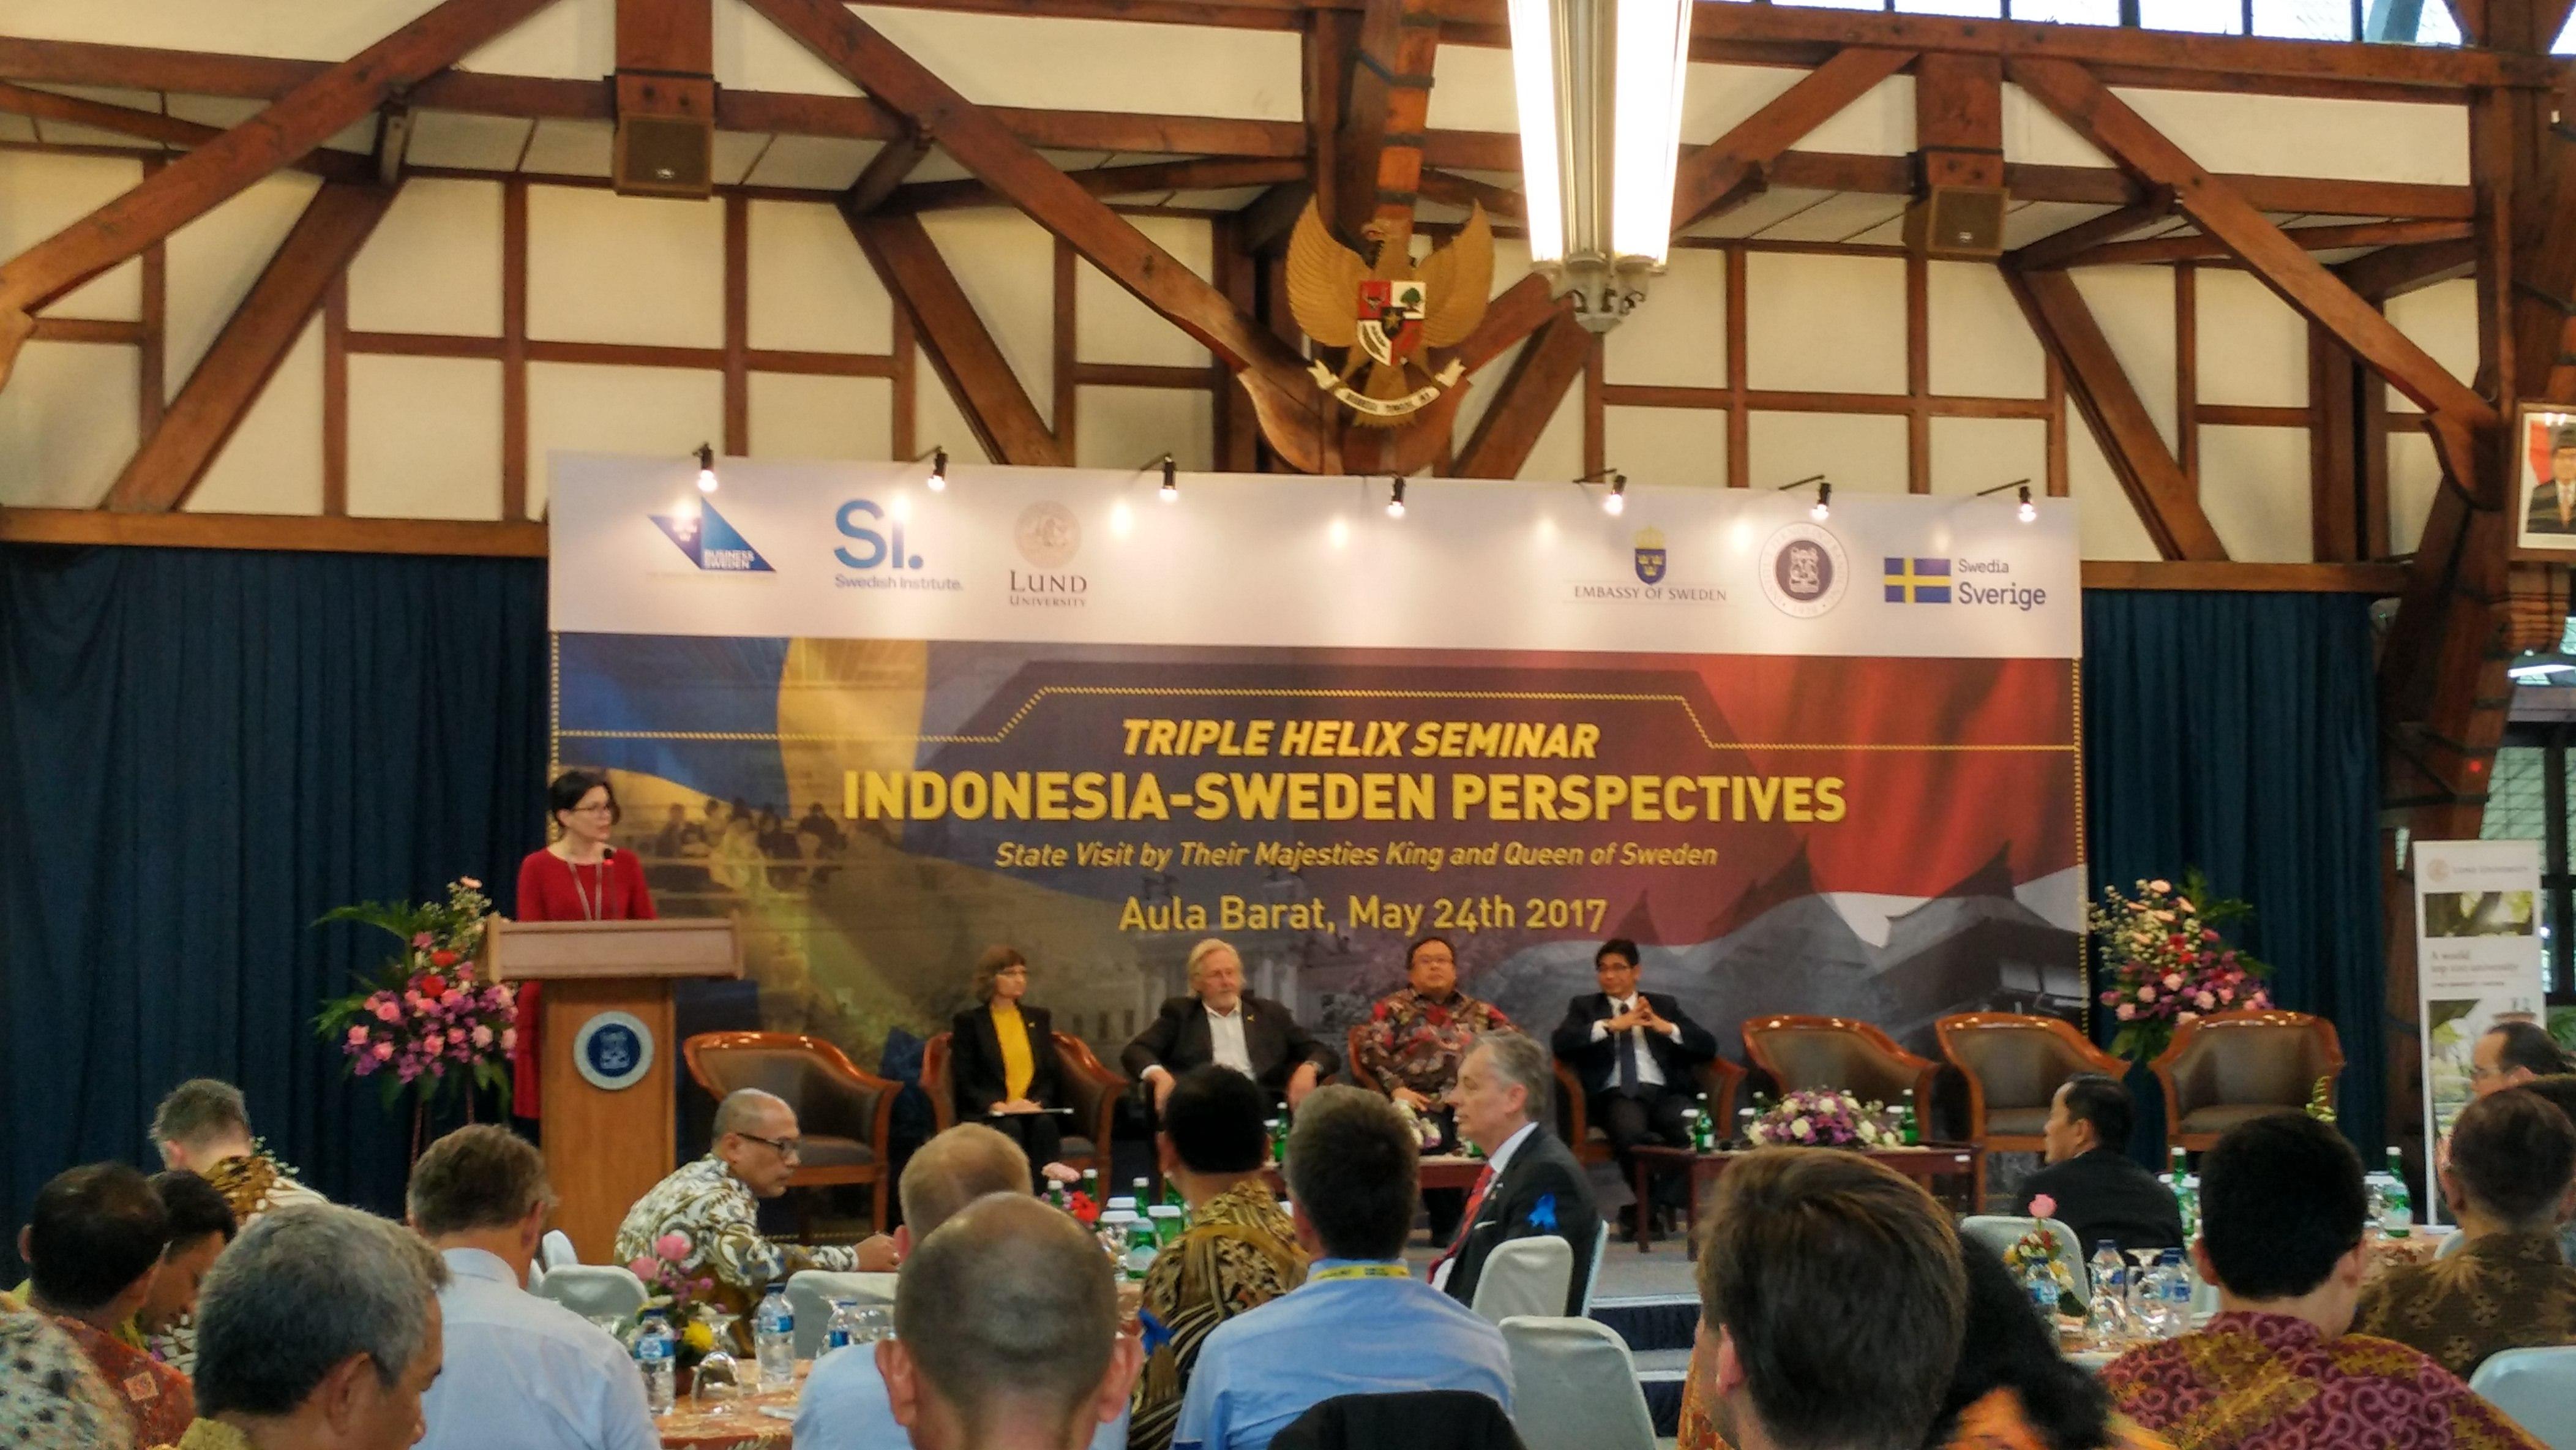 Perkuat Kerjasama Indonesia-Swedia, Raja dan Ratu Swedia Kunjungi ITB